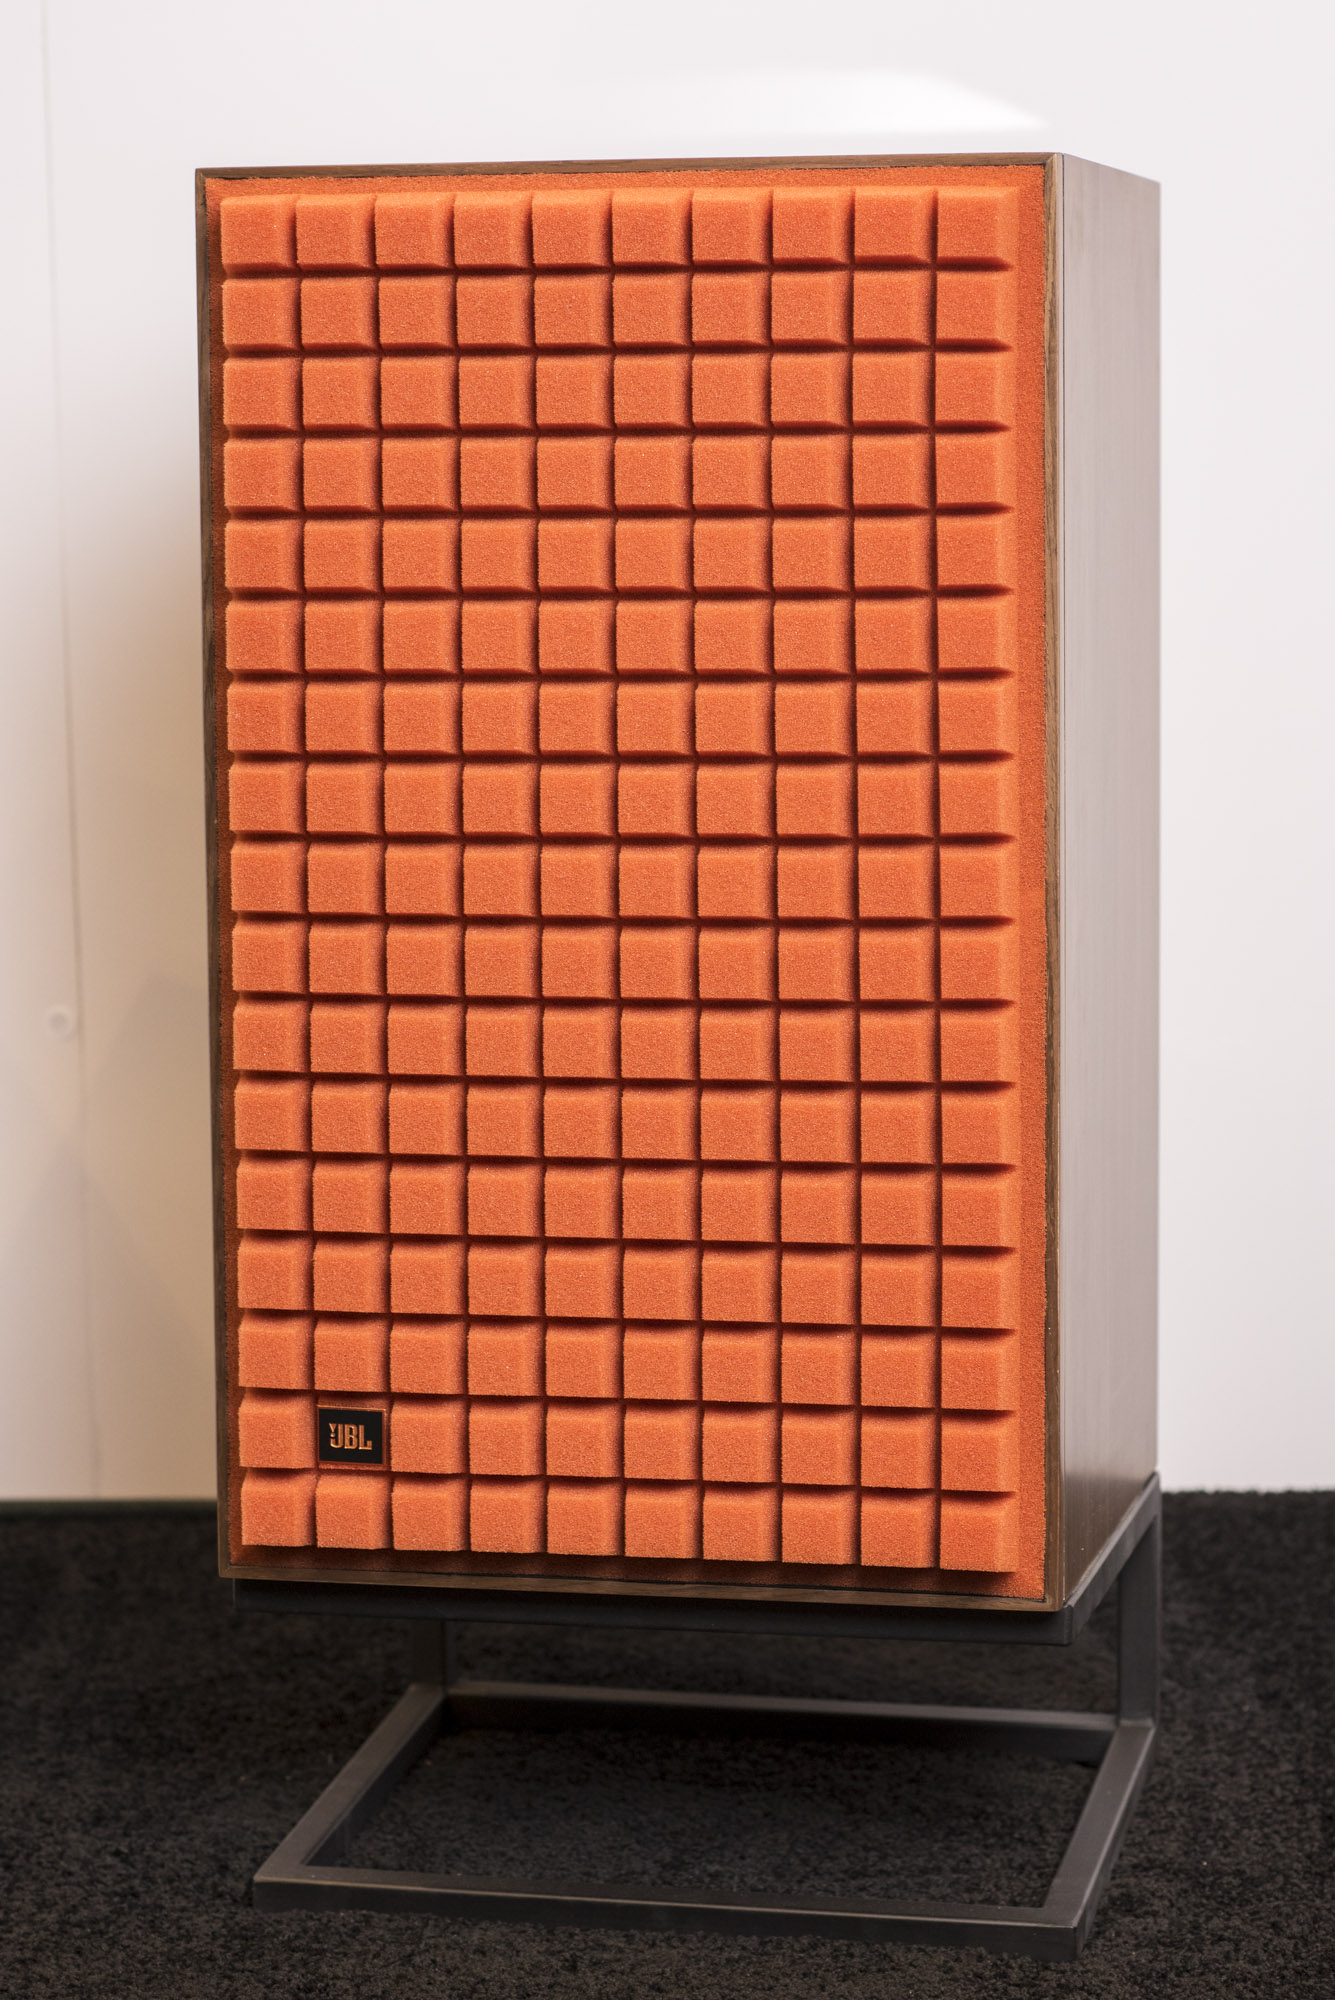 JBL Releases Updated Iconic JBL L100 Speakers   Audioholics